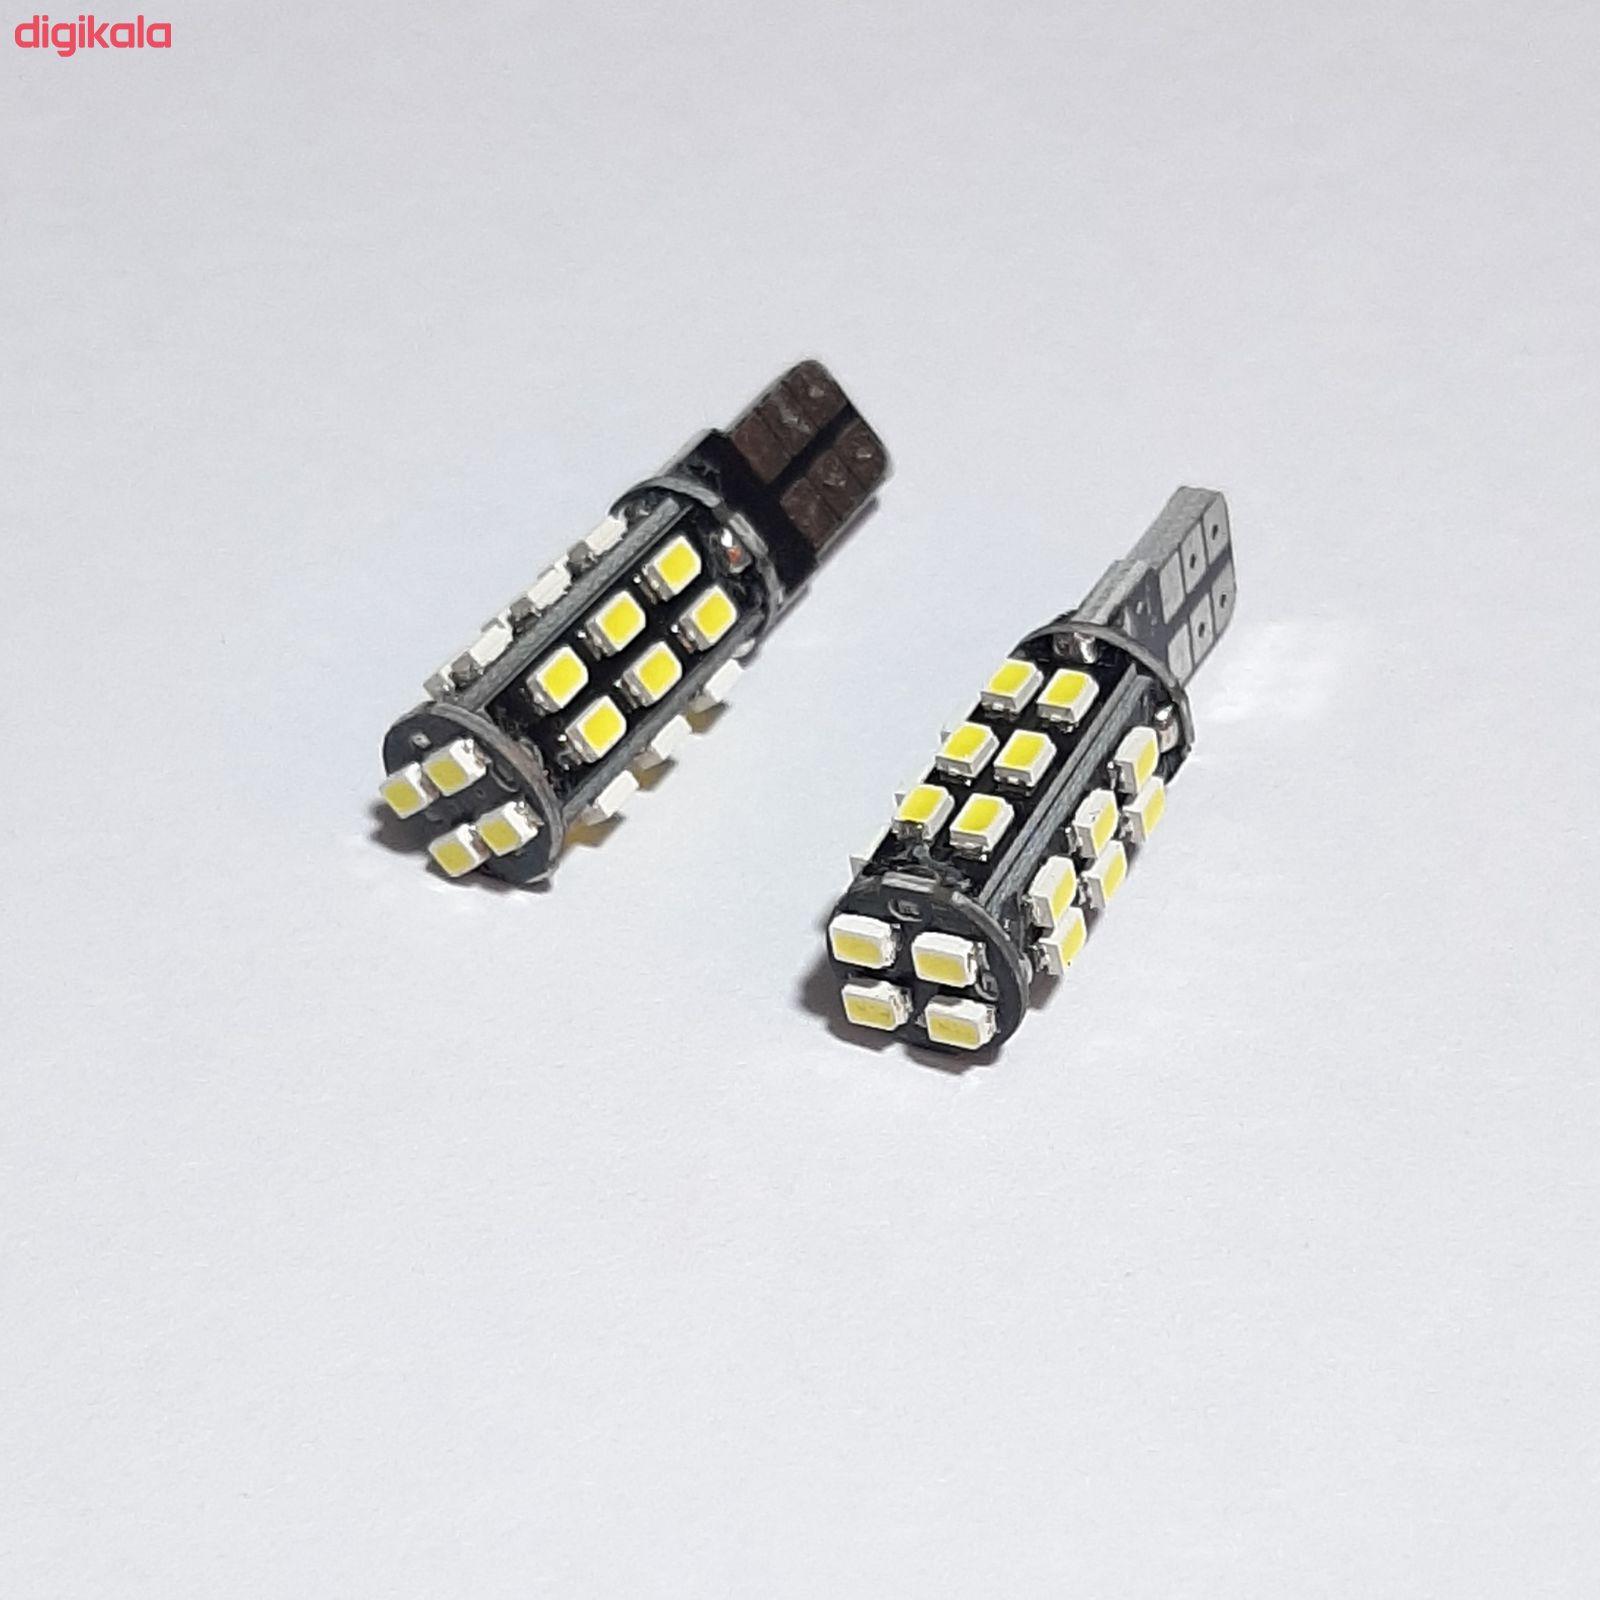 لامپ اس ام دی خودرو مدل S28 بسته 2 عددی main 1 1